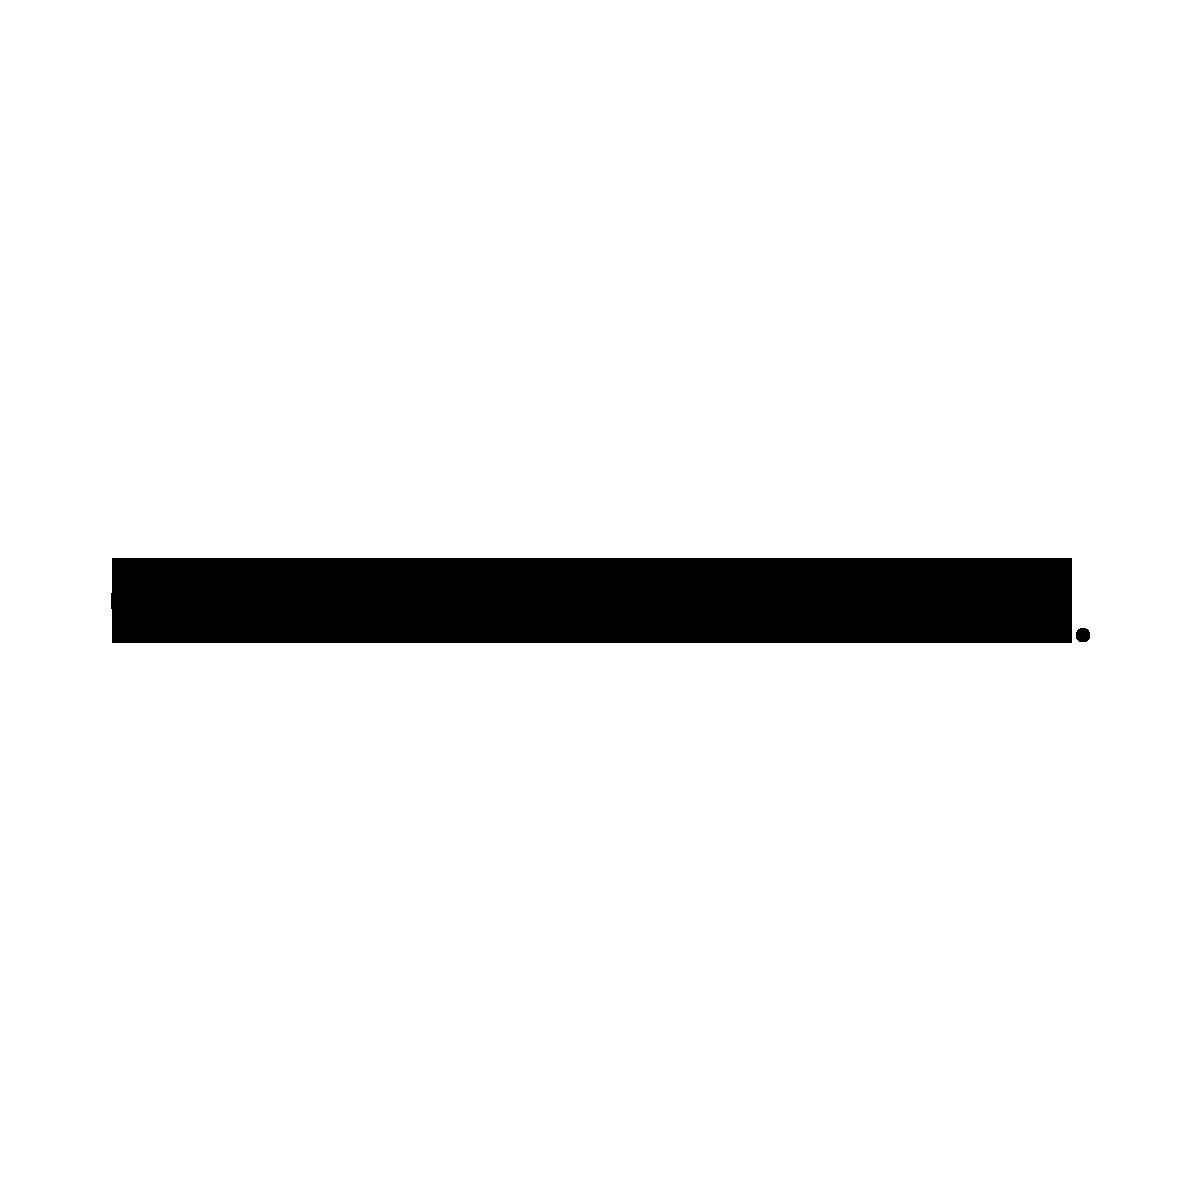 Sandale-Leder-mit-Knöchelriemen-Grau